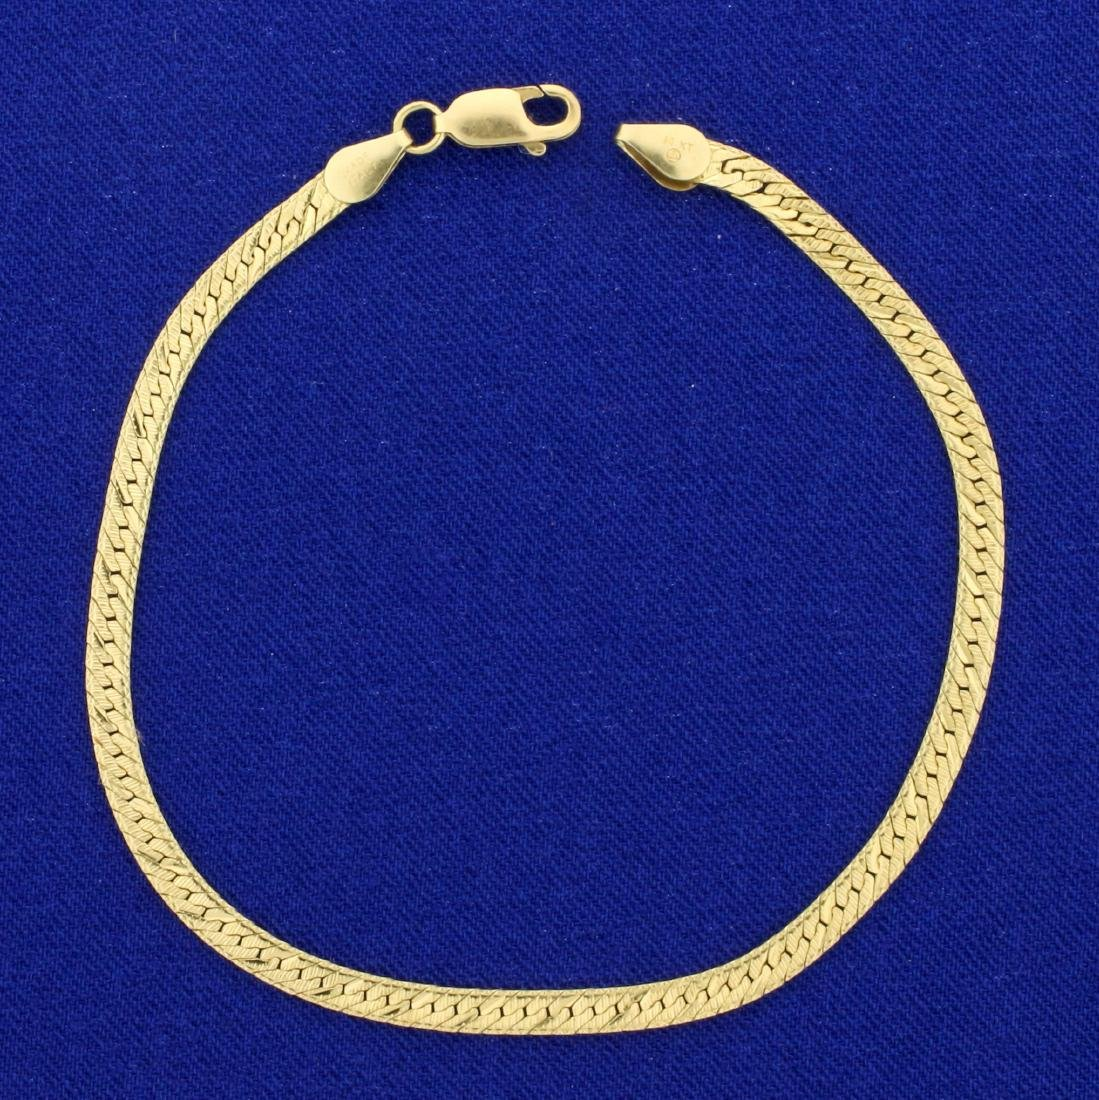 Italian Made Diamond Cut Herringbone Bracelet in 14K